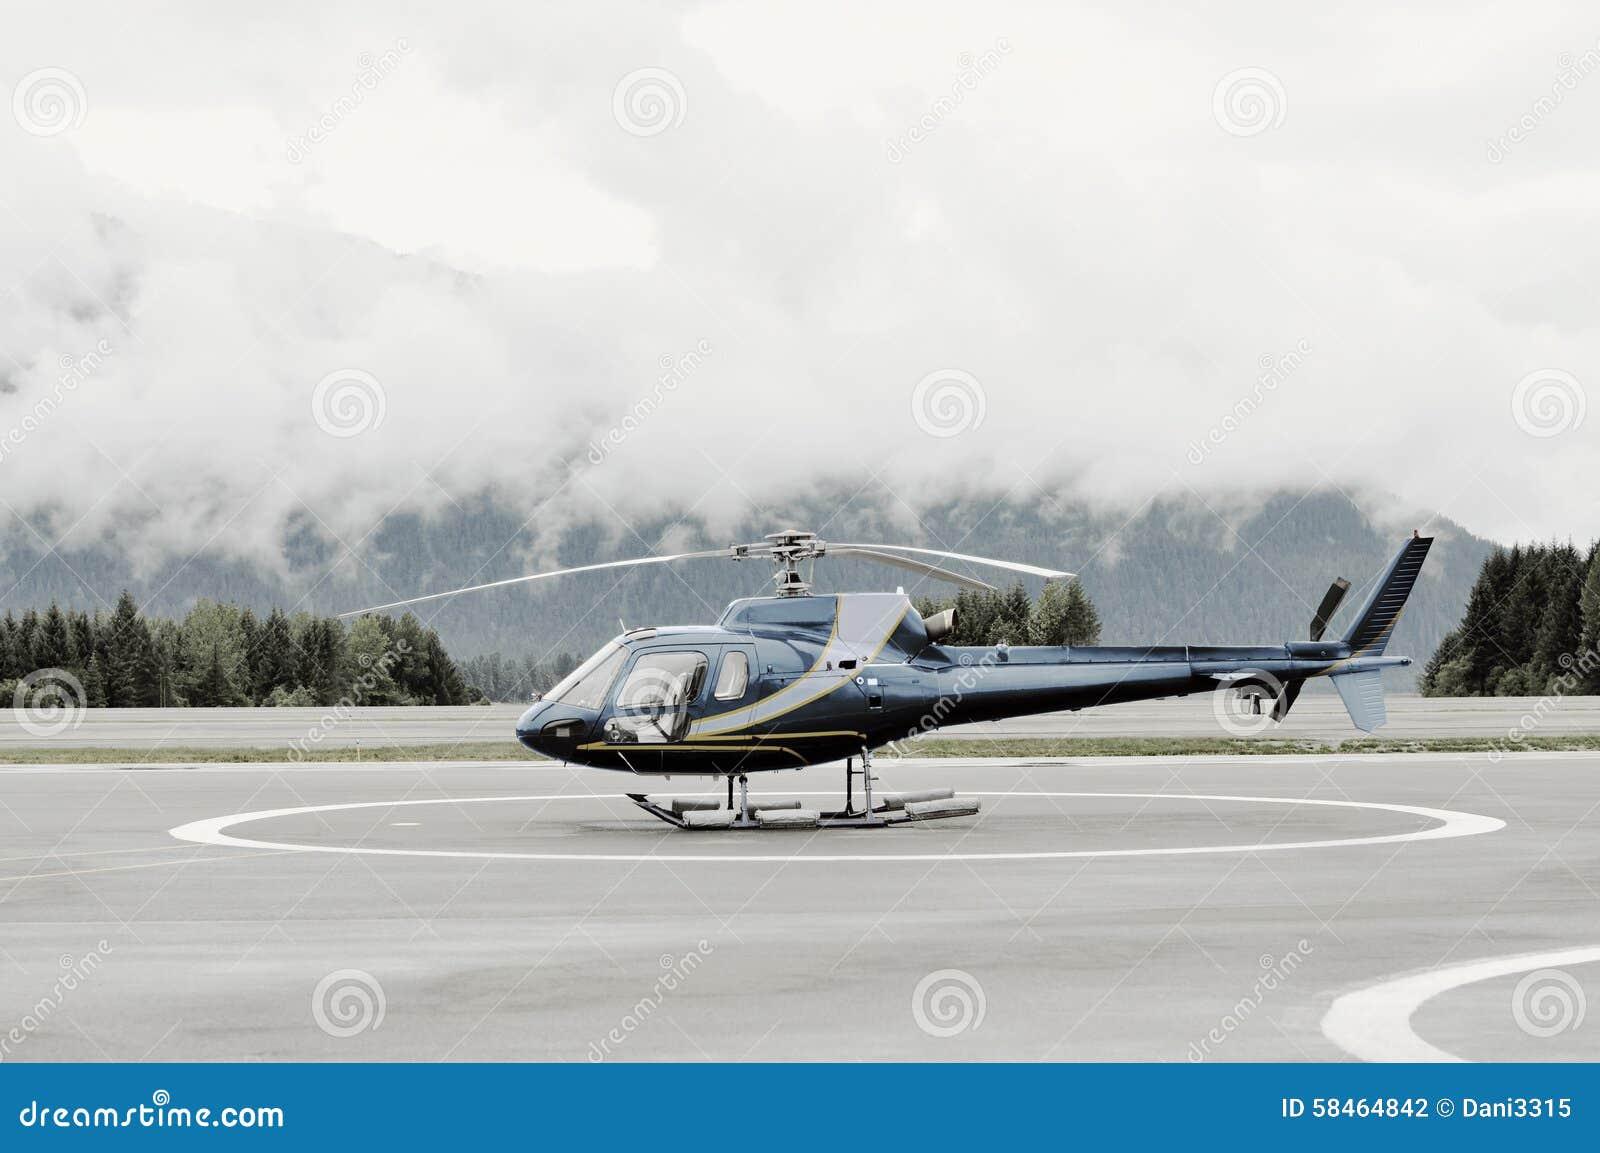 Singel-motor helikopter på plattformen